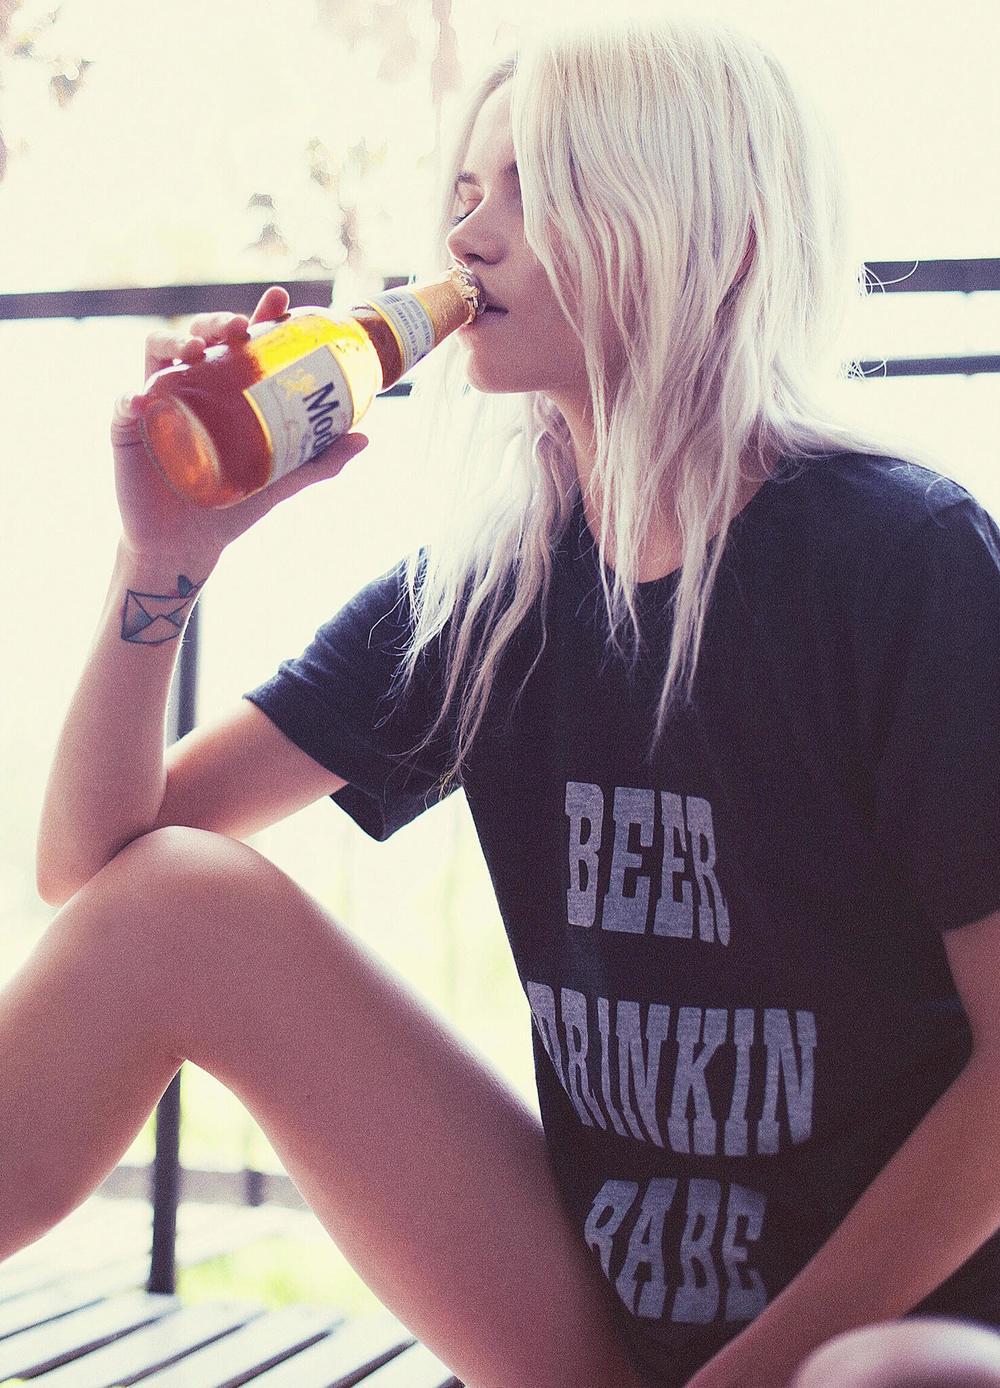 zoe_beer_drinkin_babe_tee_62a1128d-453c-4f23-b083-8b3eedb13772.jpg